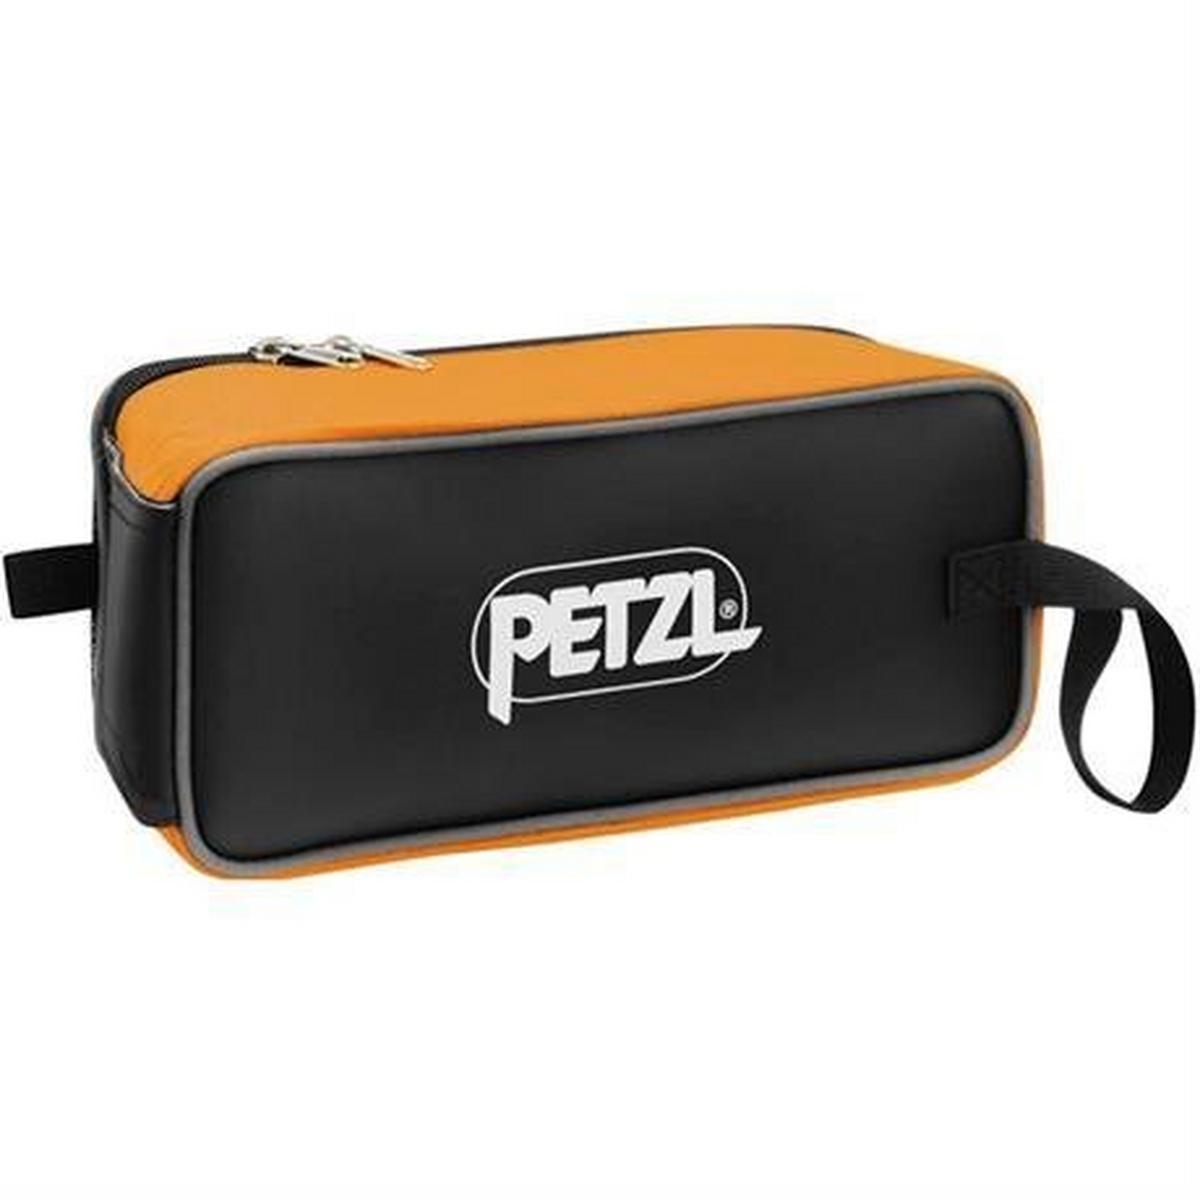 Petzl Charlet Petzl Spare/Accessory: Crampon Bag Fakir